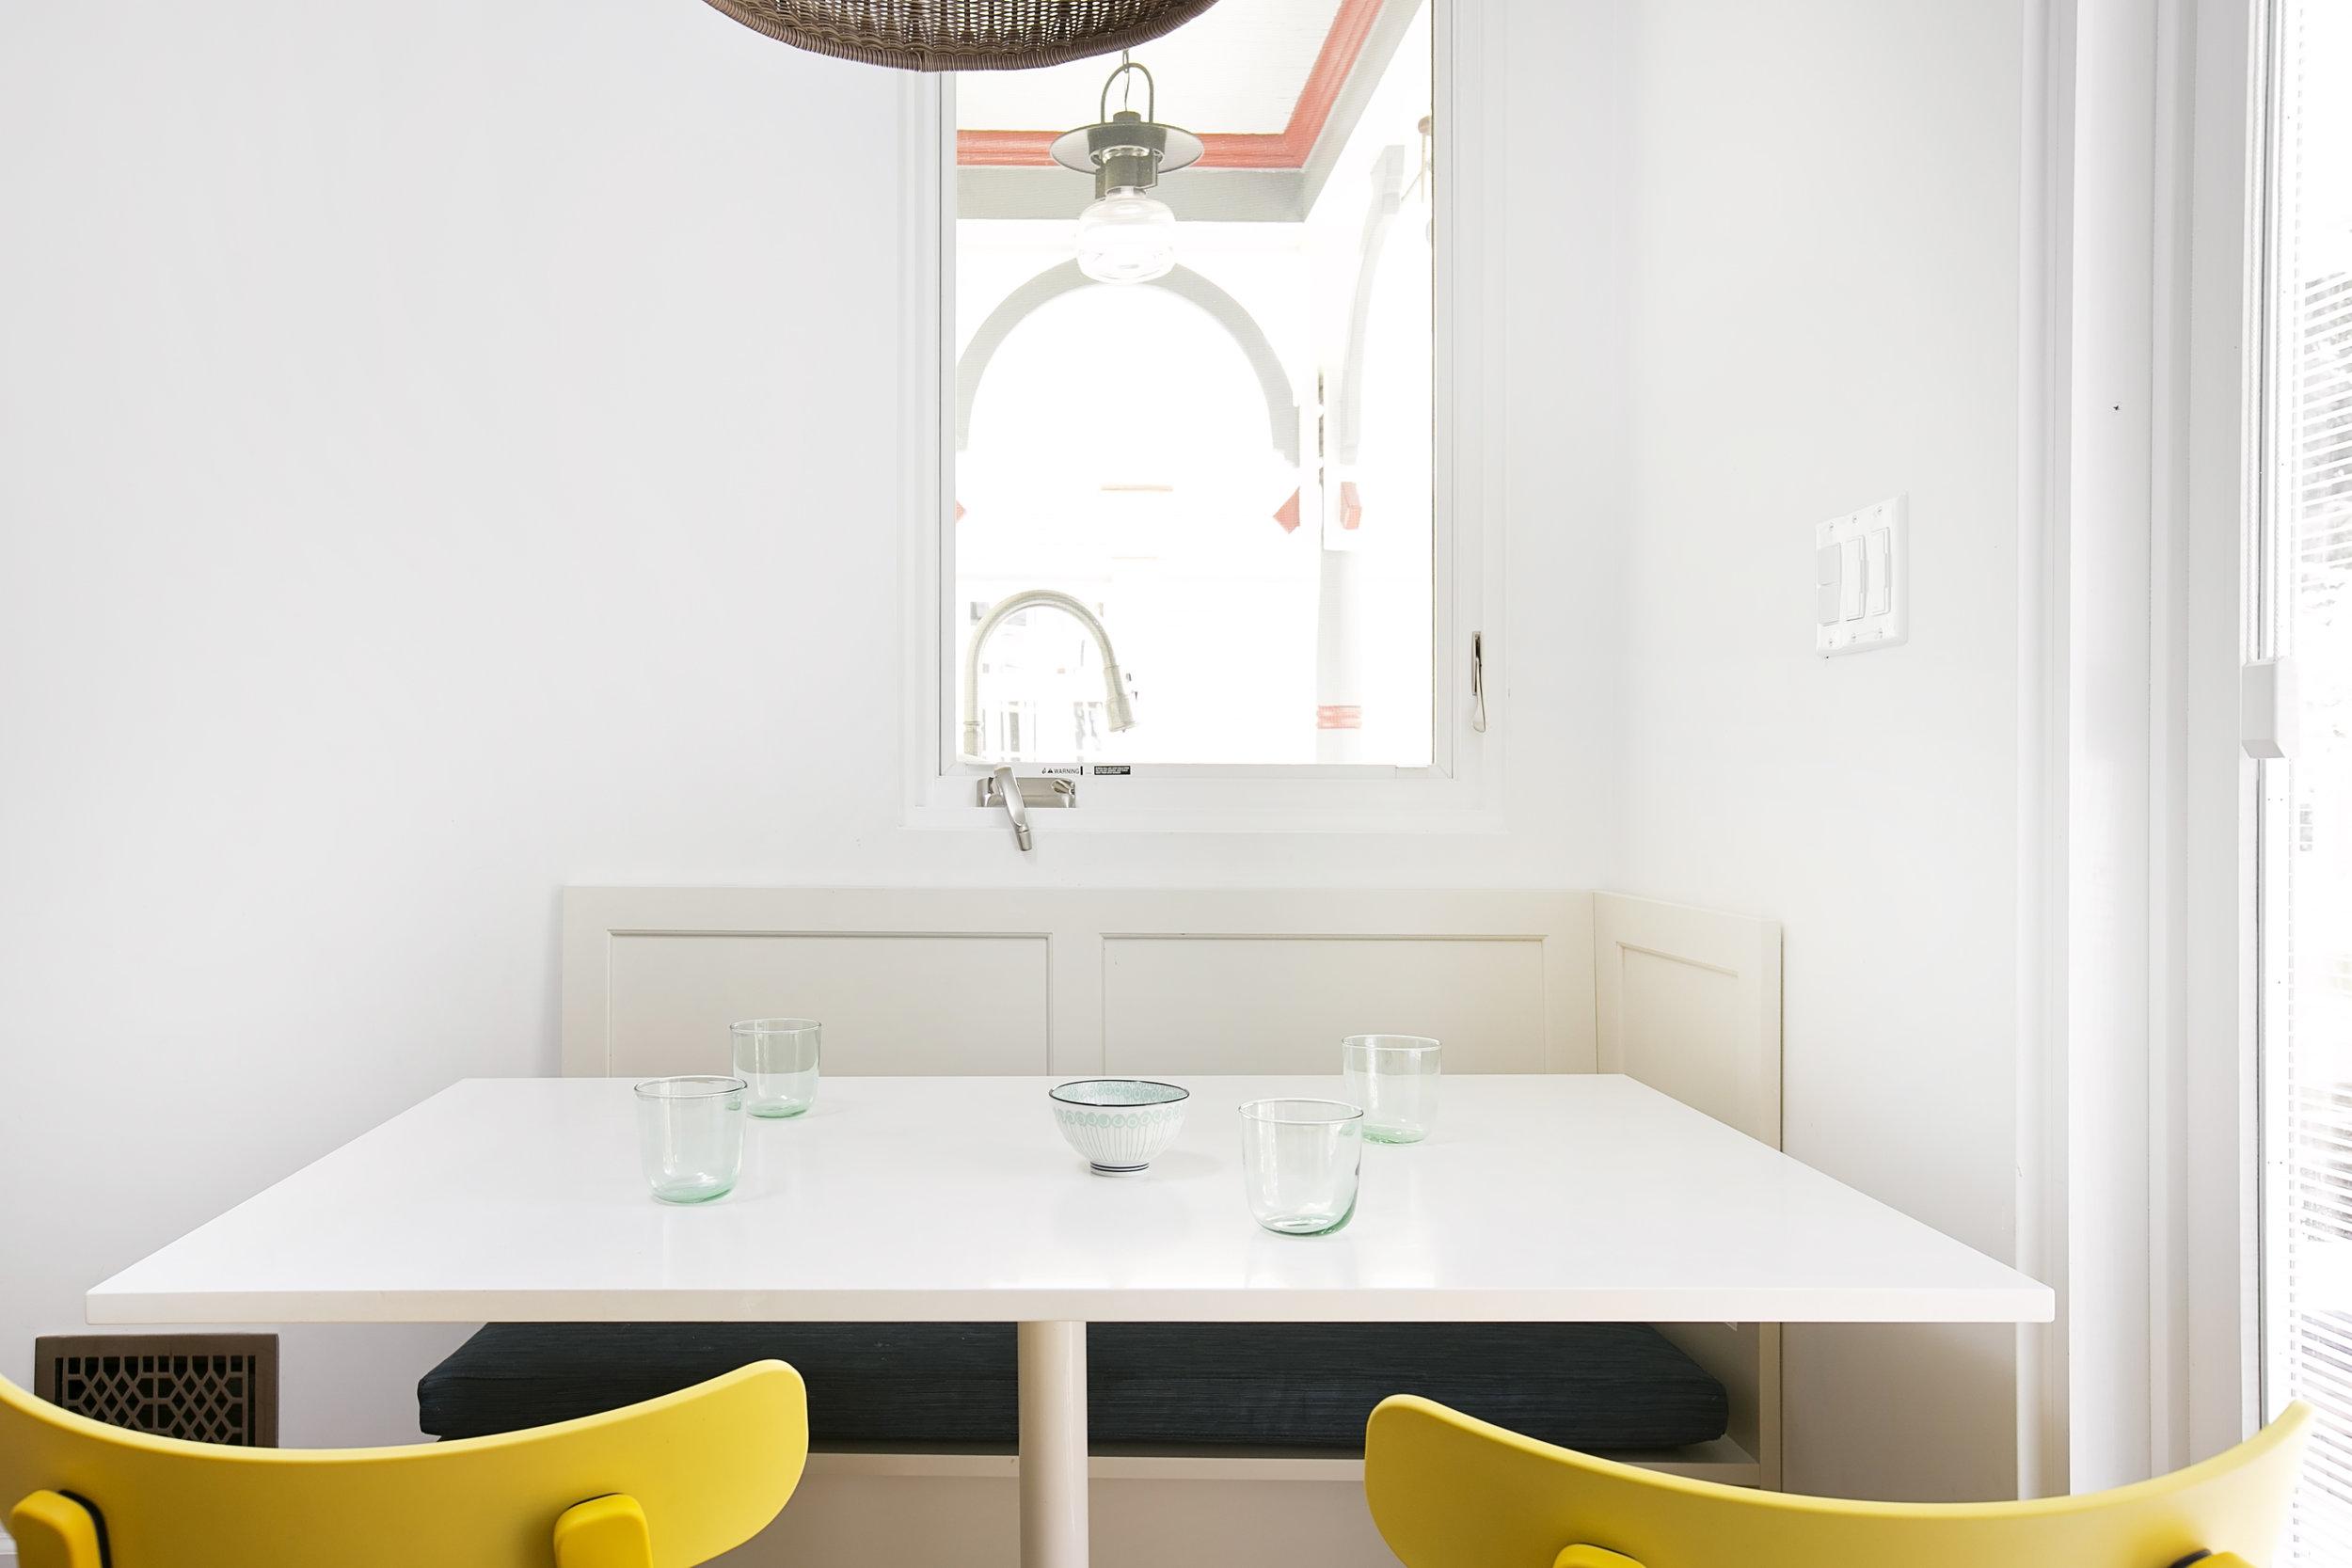 Cozy-Breakfast-Nook-Yellow-Chairs.jpg